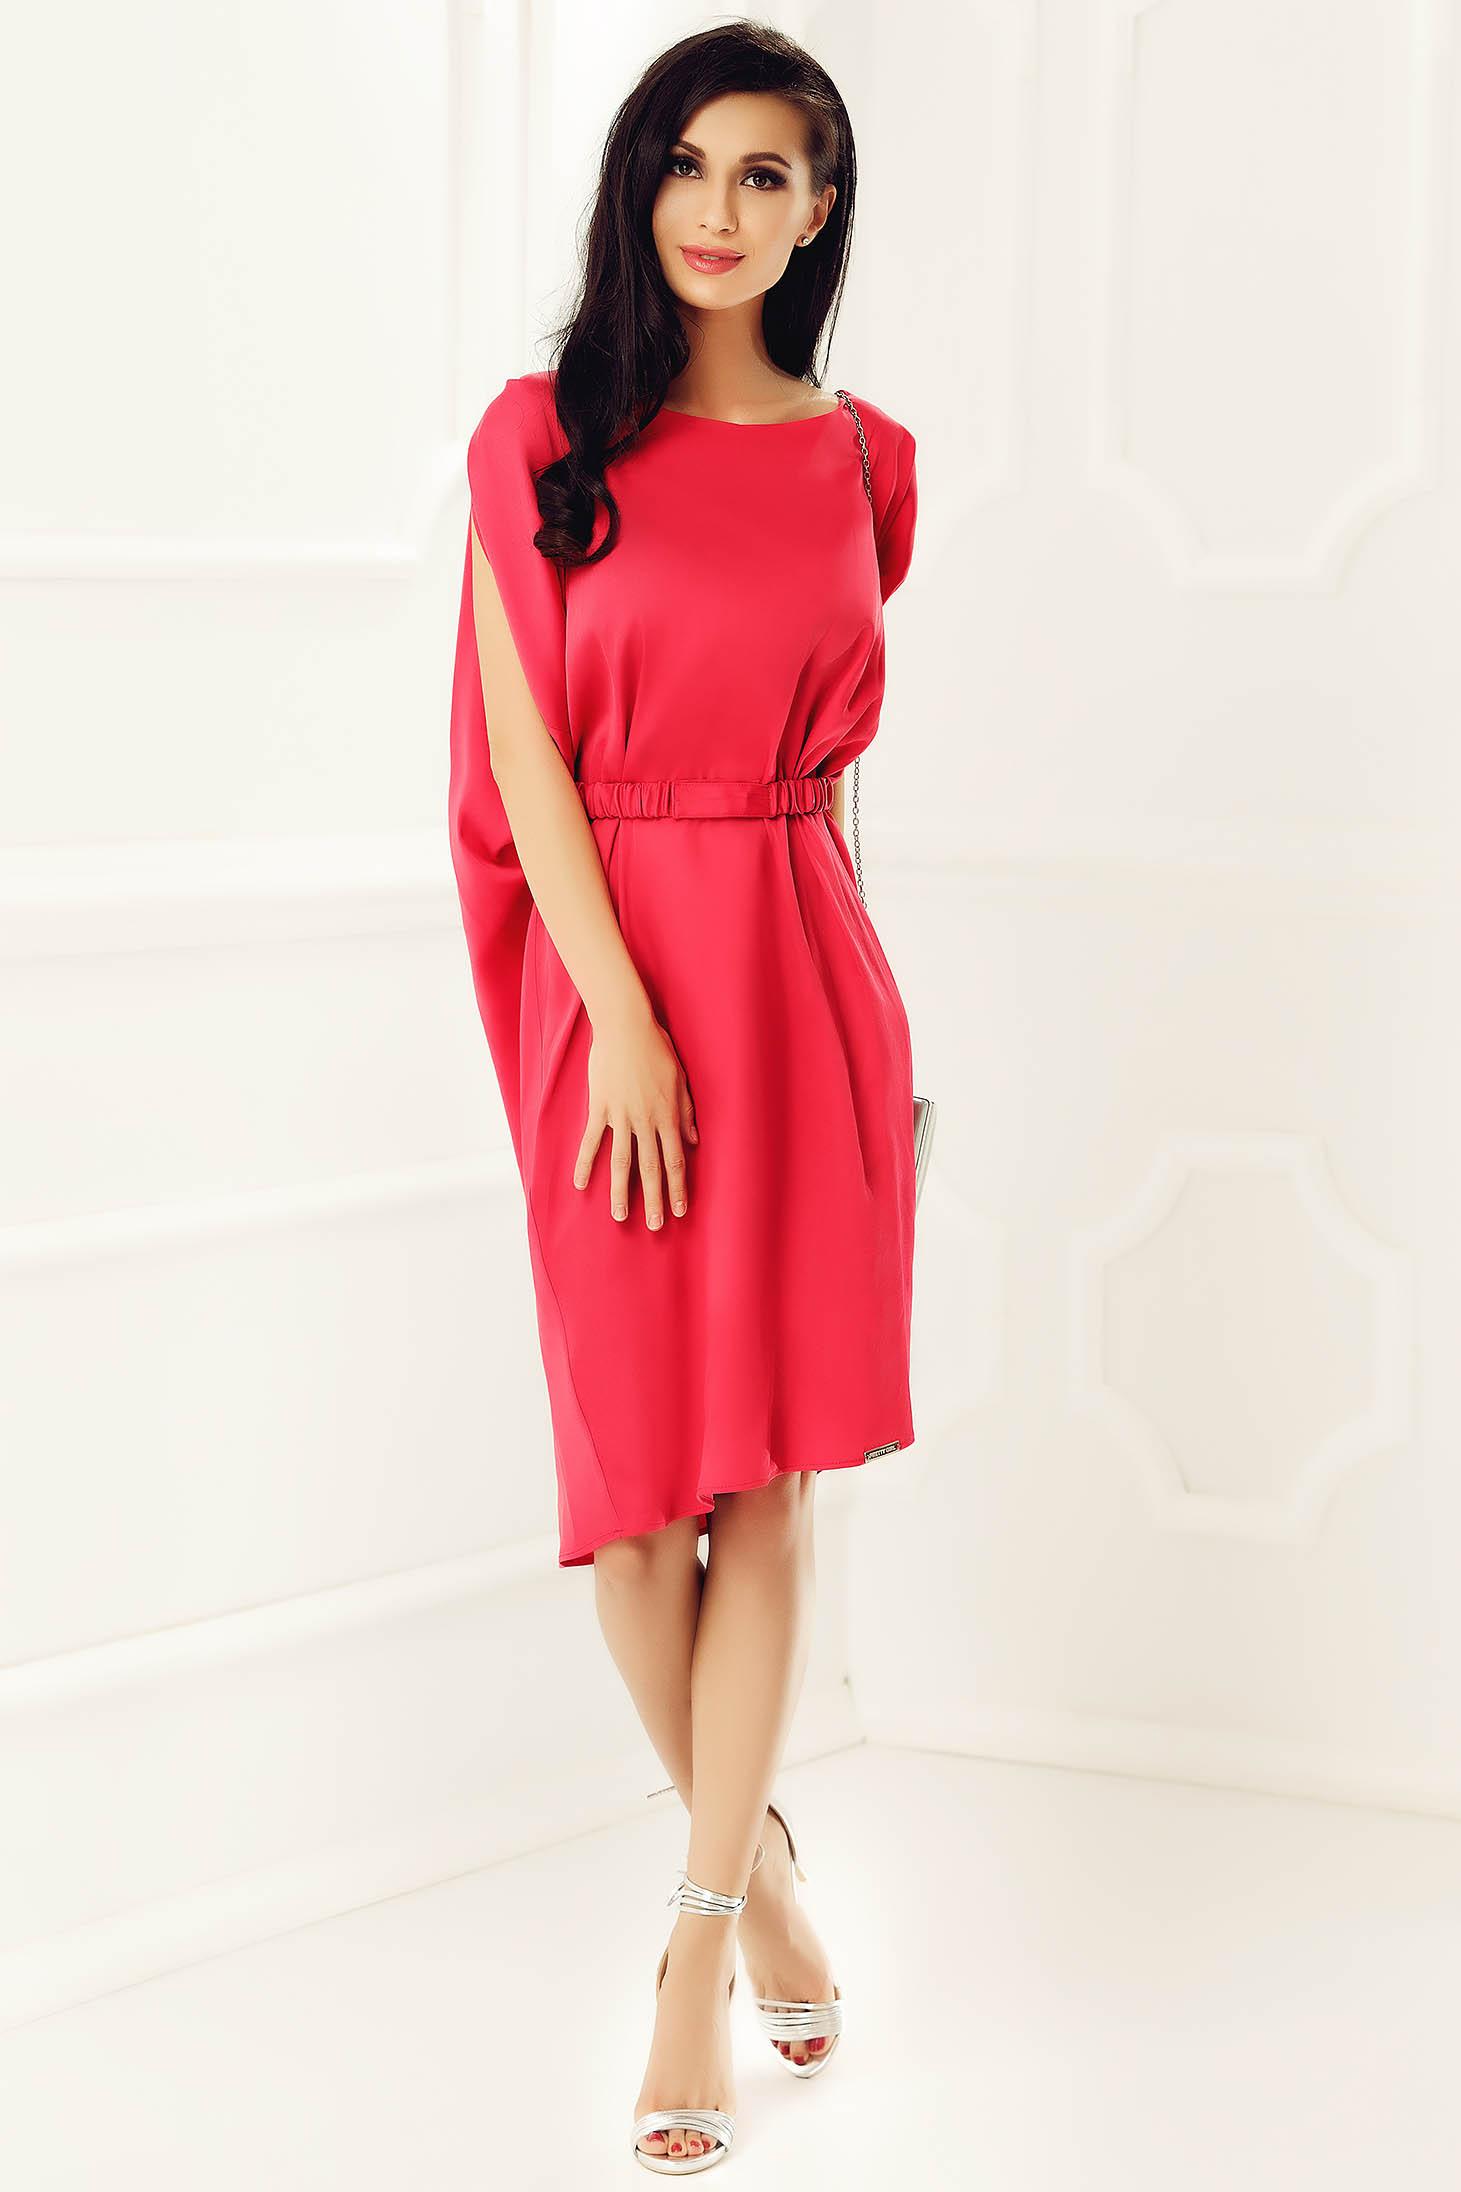 Rochie PrettyGirl rosie de party cu croi larg din material satinat accesorizata cu cordon